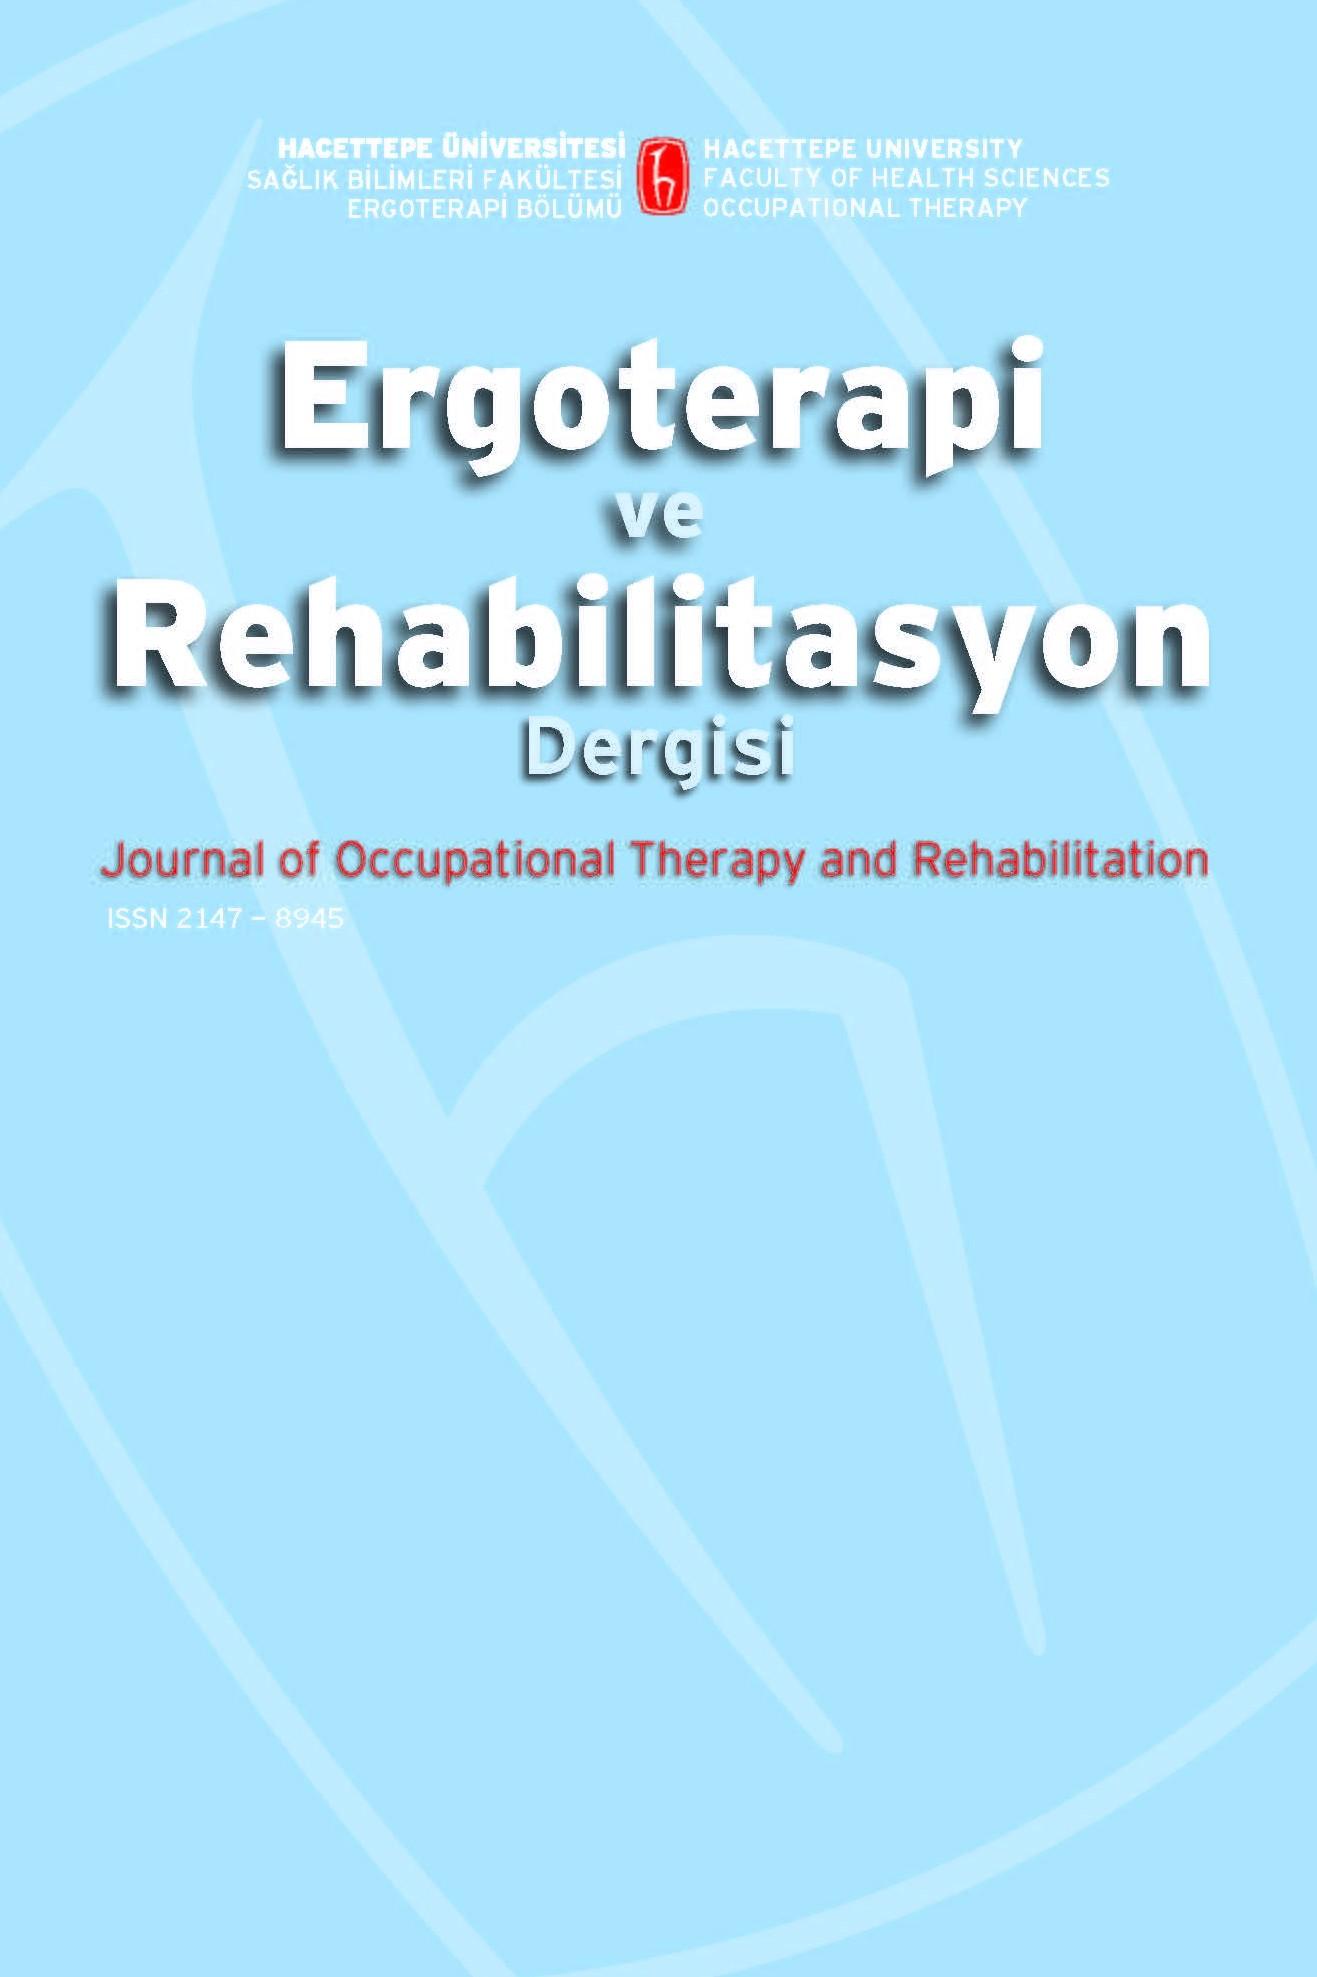 Ergoterapi ve Rehabilitasyon Dergisi